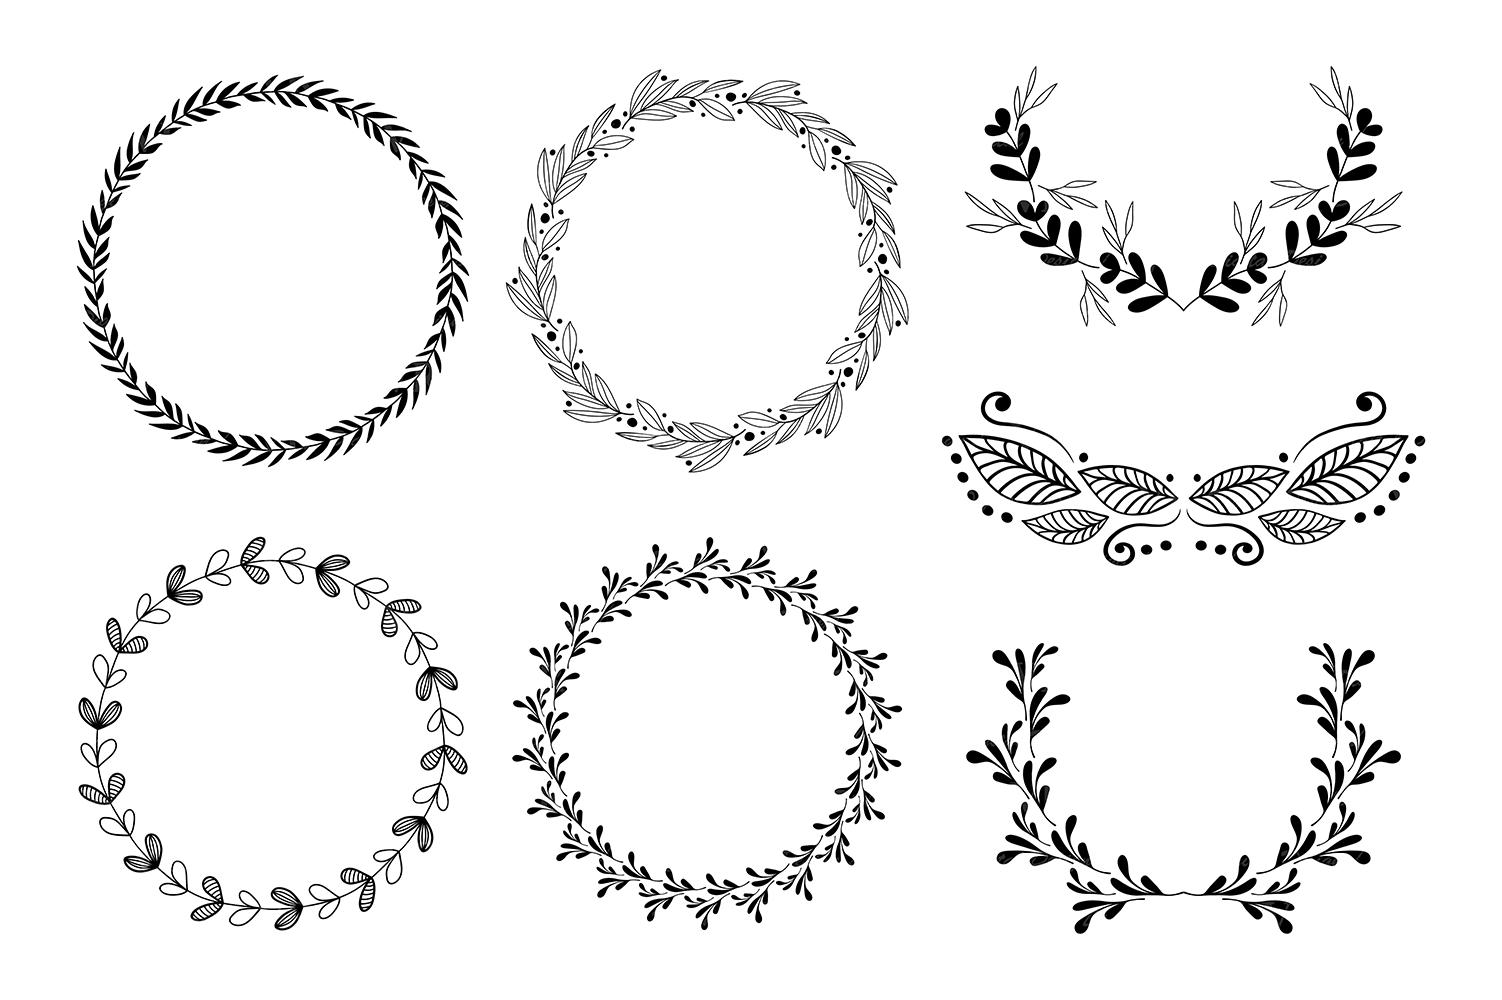 Wreaths Clipart Hand Drawn Black Design Elements Digital